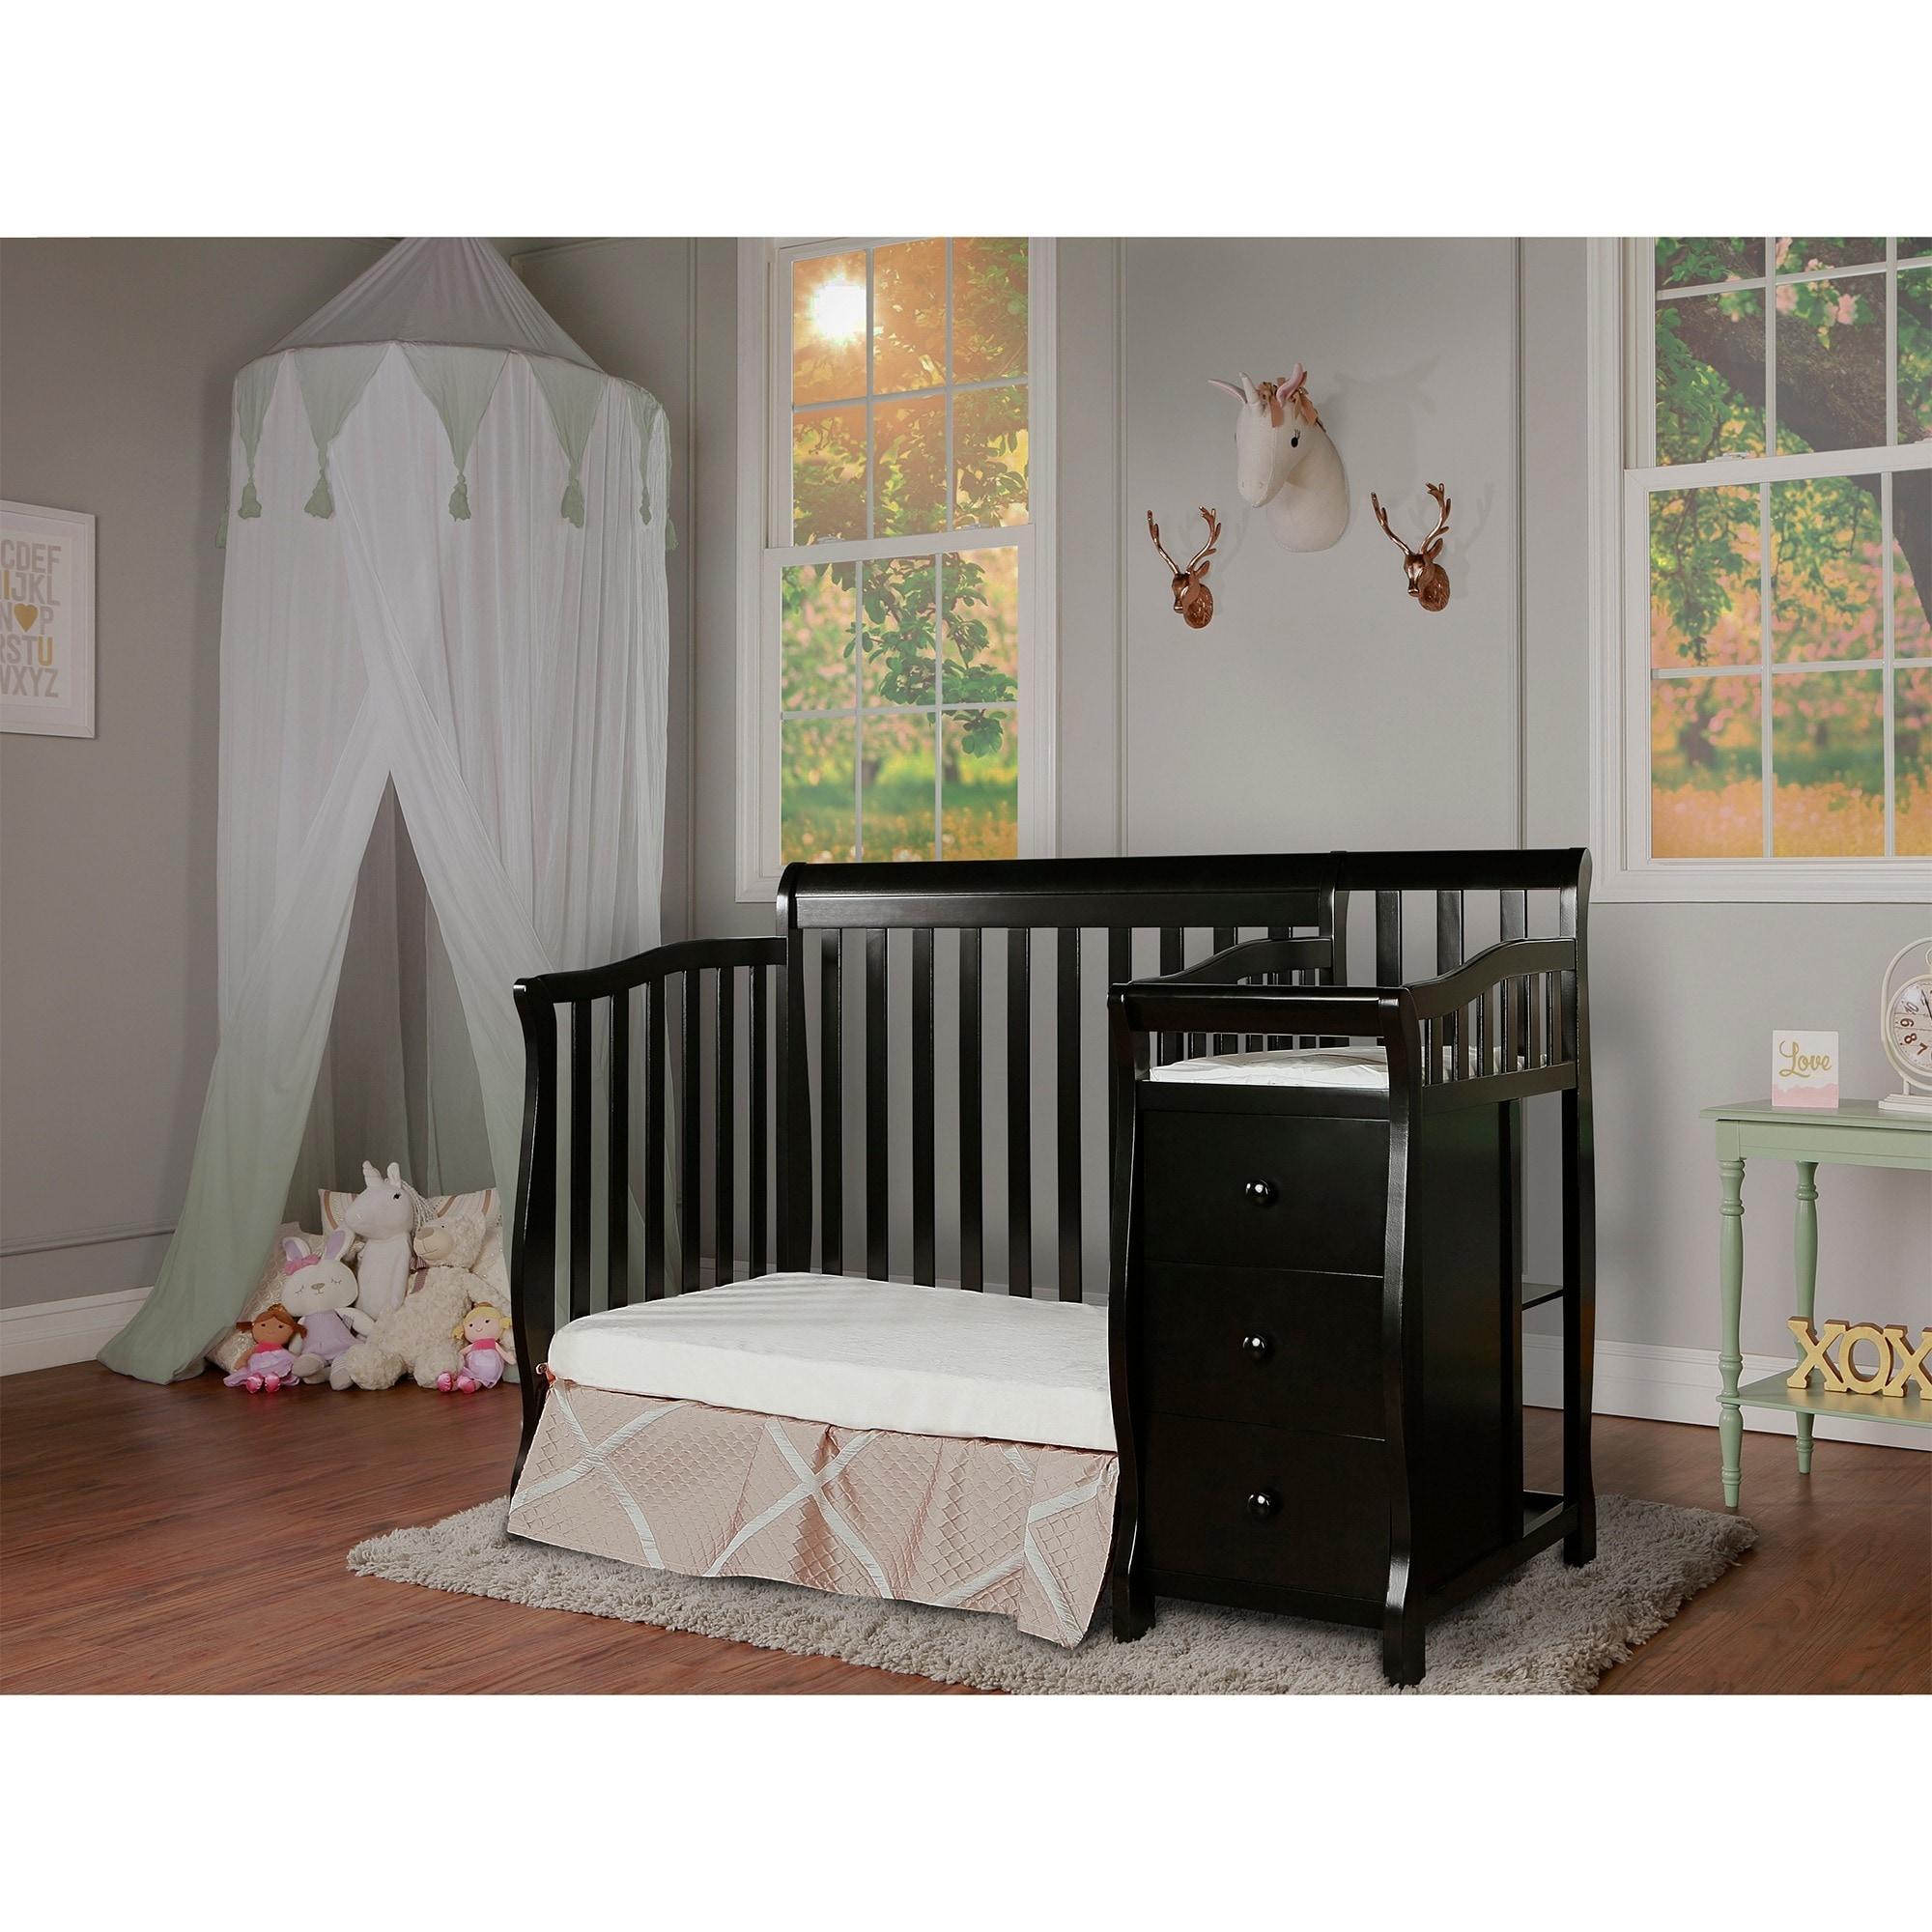 s dream georgia baby cribs kids product eleanor eleano crib and babys